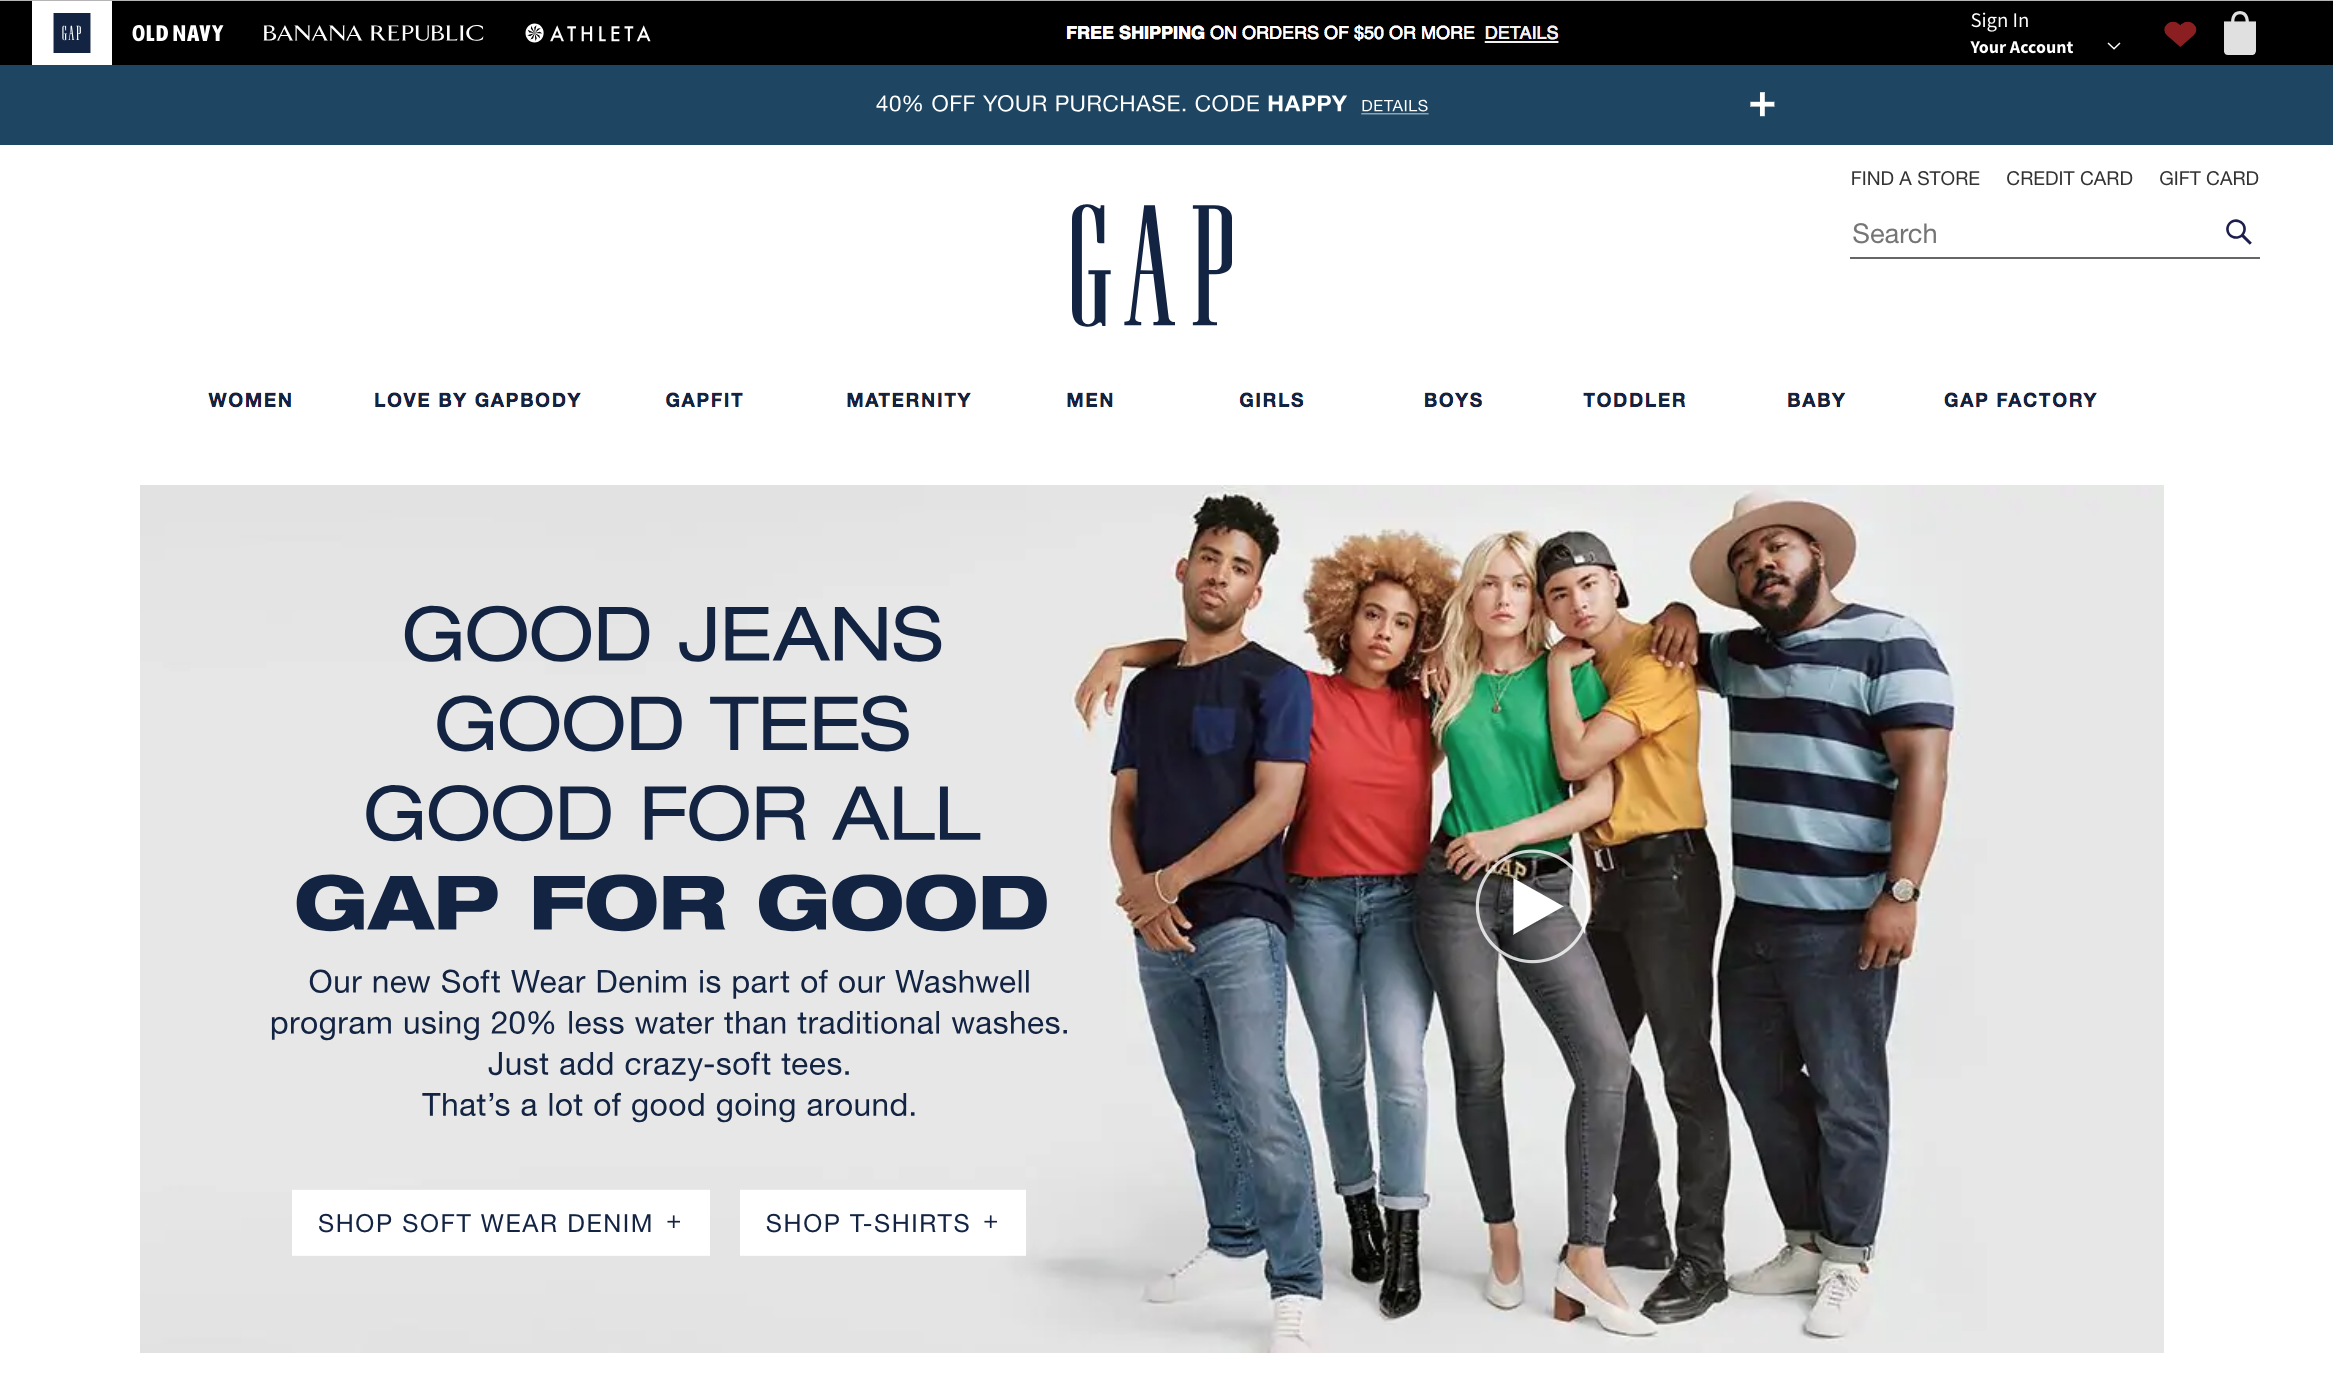 The Gap Credit Cards & Rewards Program - Worth Signing Up